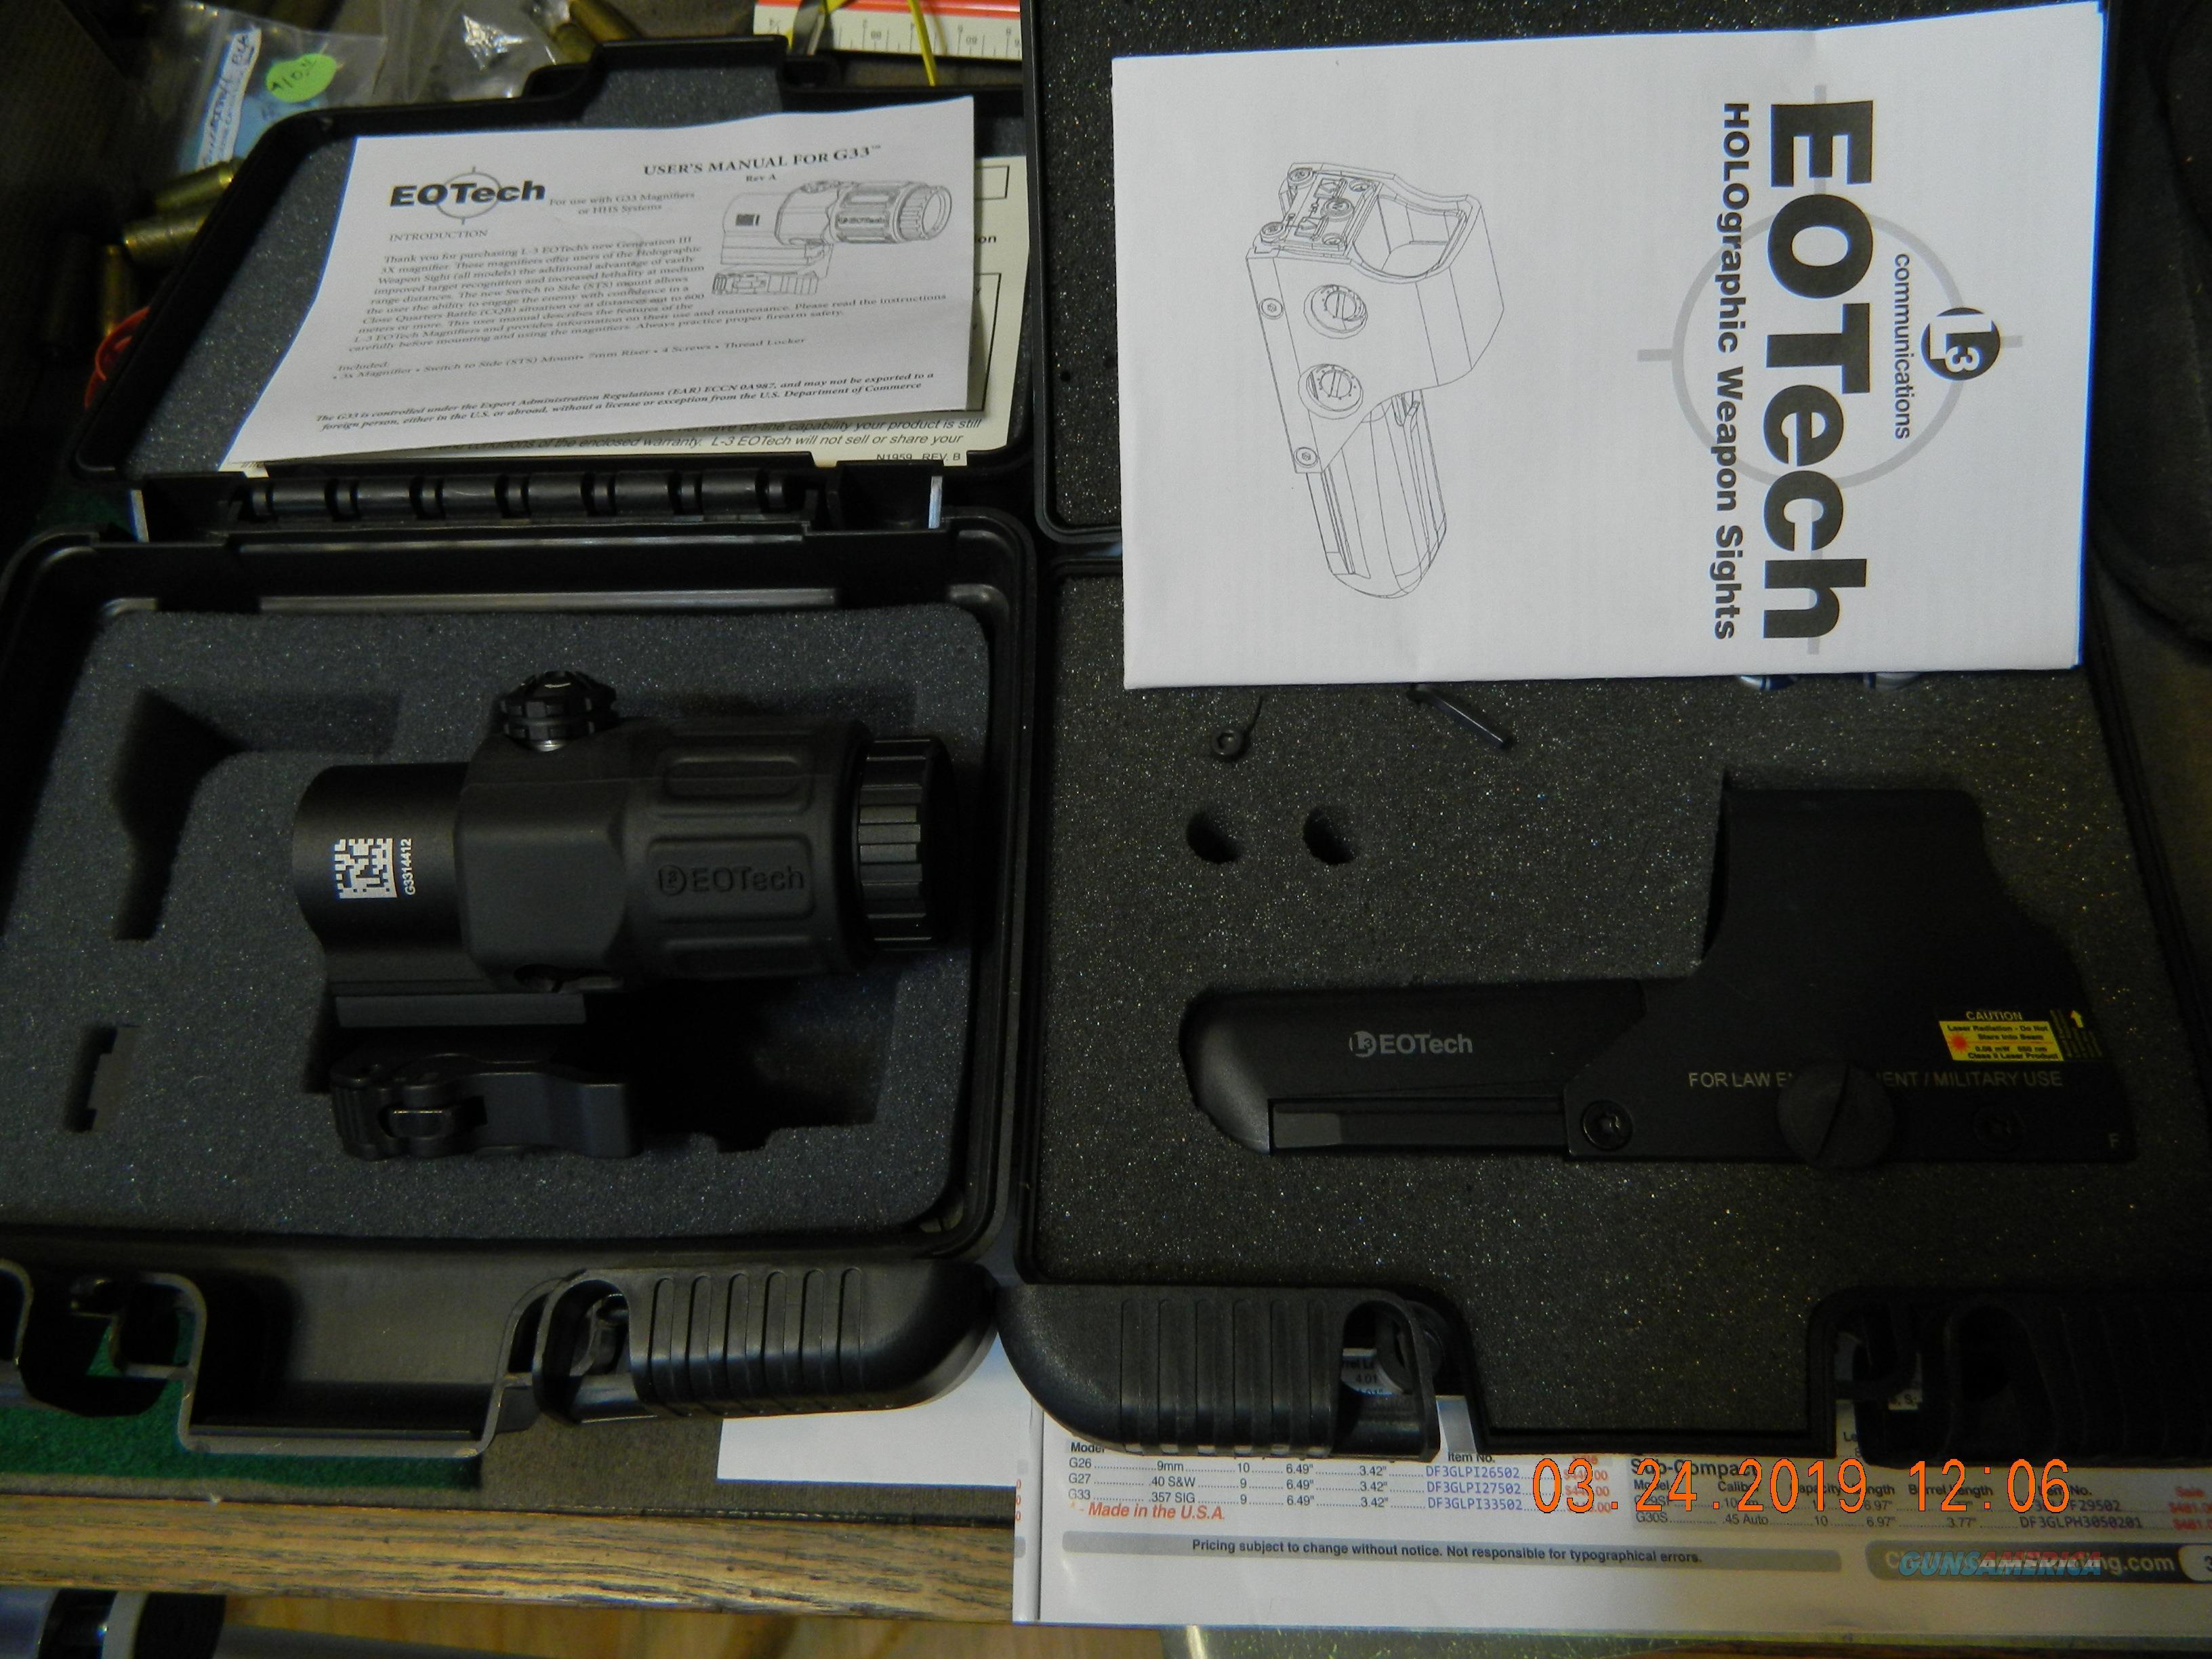 EOTECH 512.A65  w/ G33 magnifier  Non-Guns > Scopes/Mounts/Rings & Optics > Tactical Scopes > Red Dot